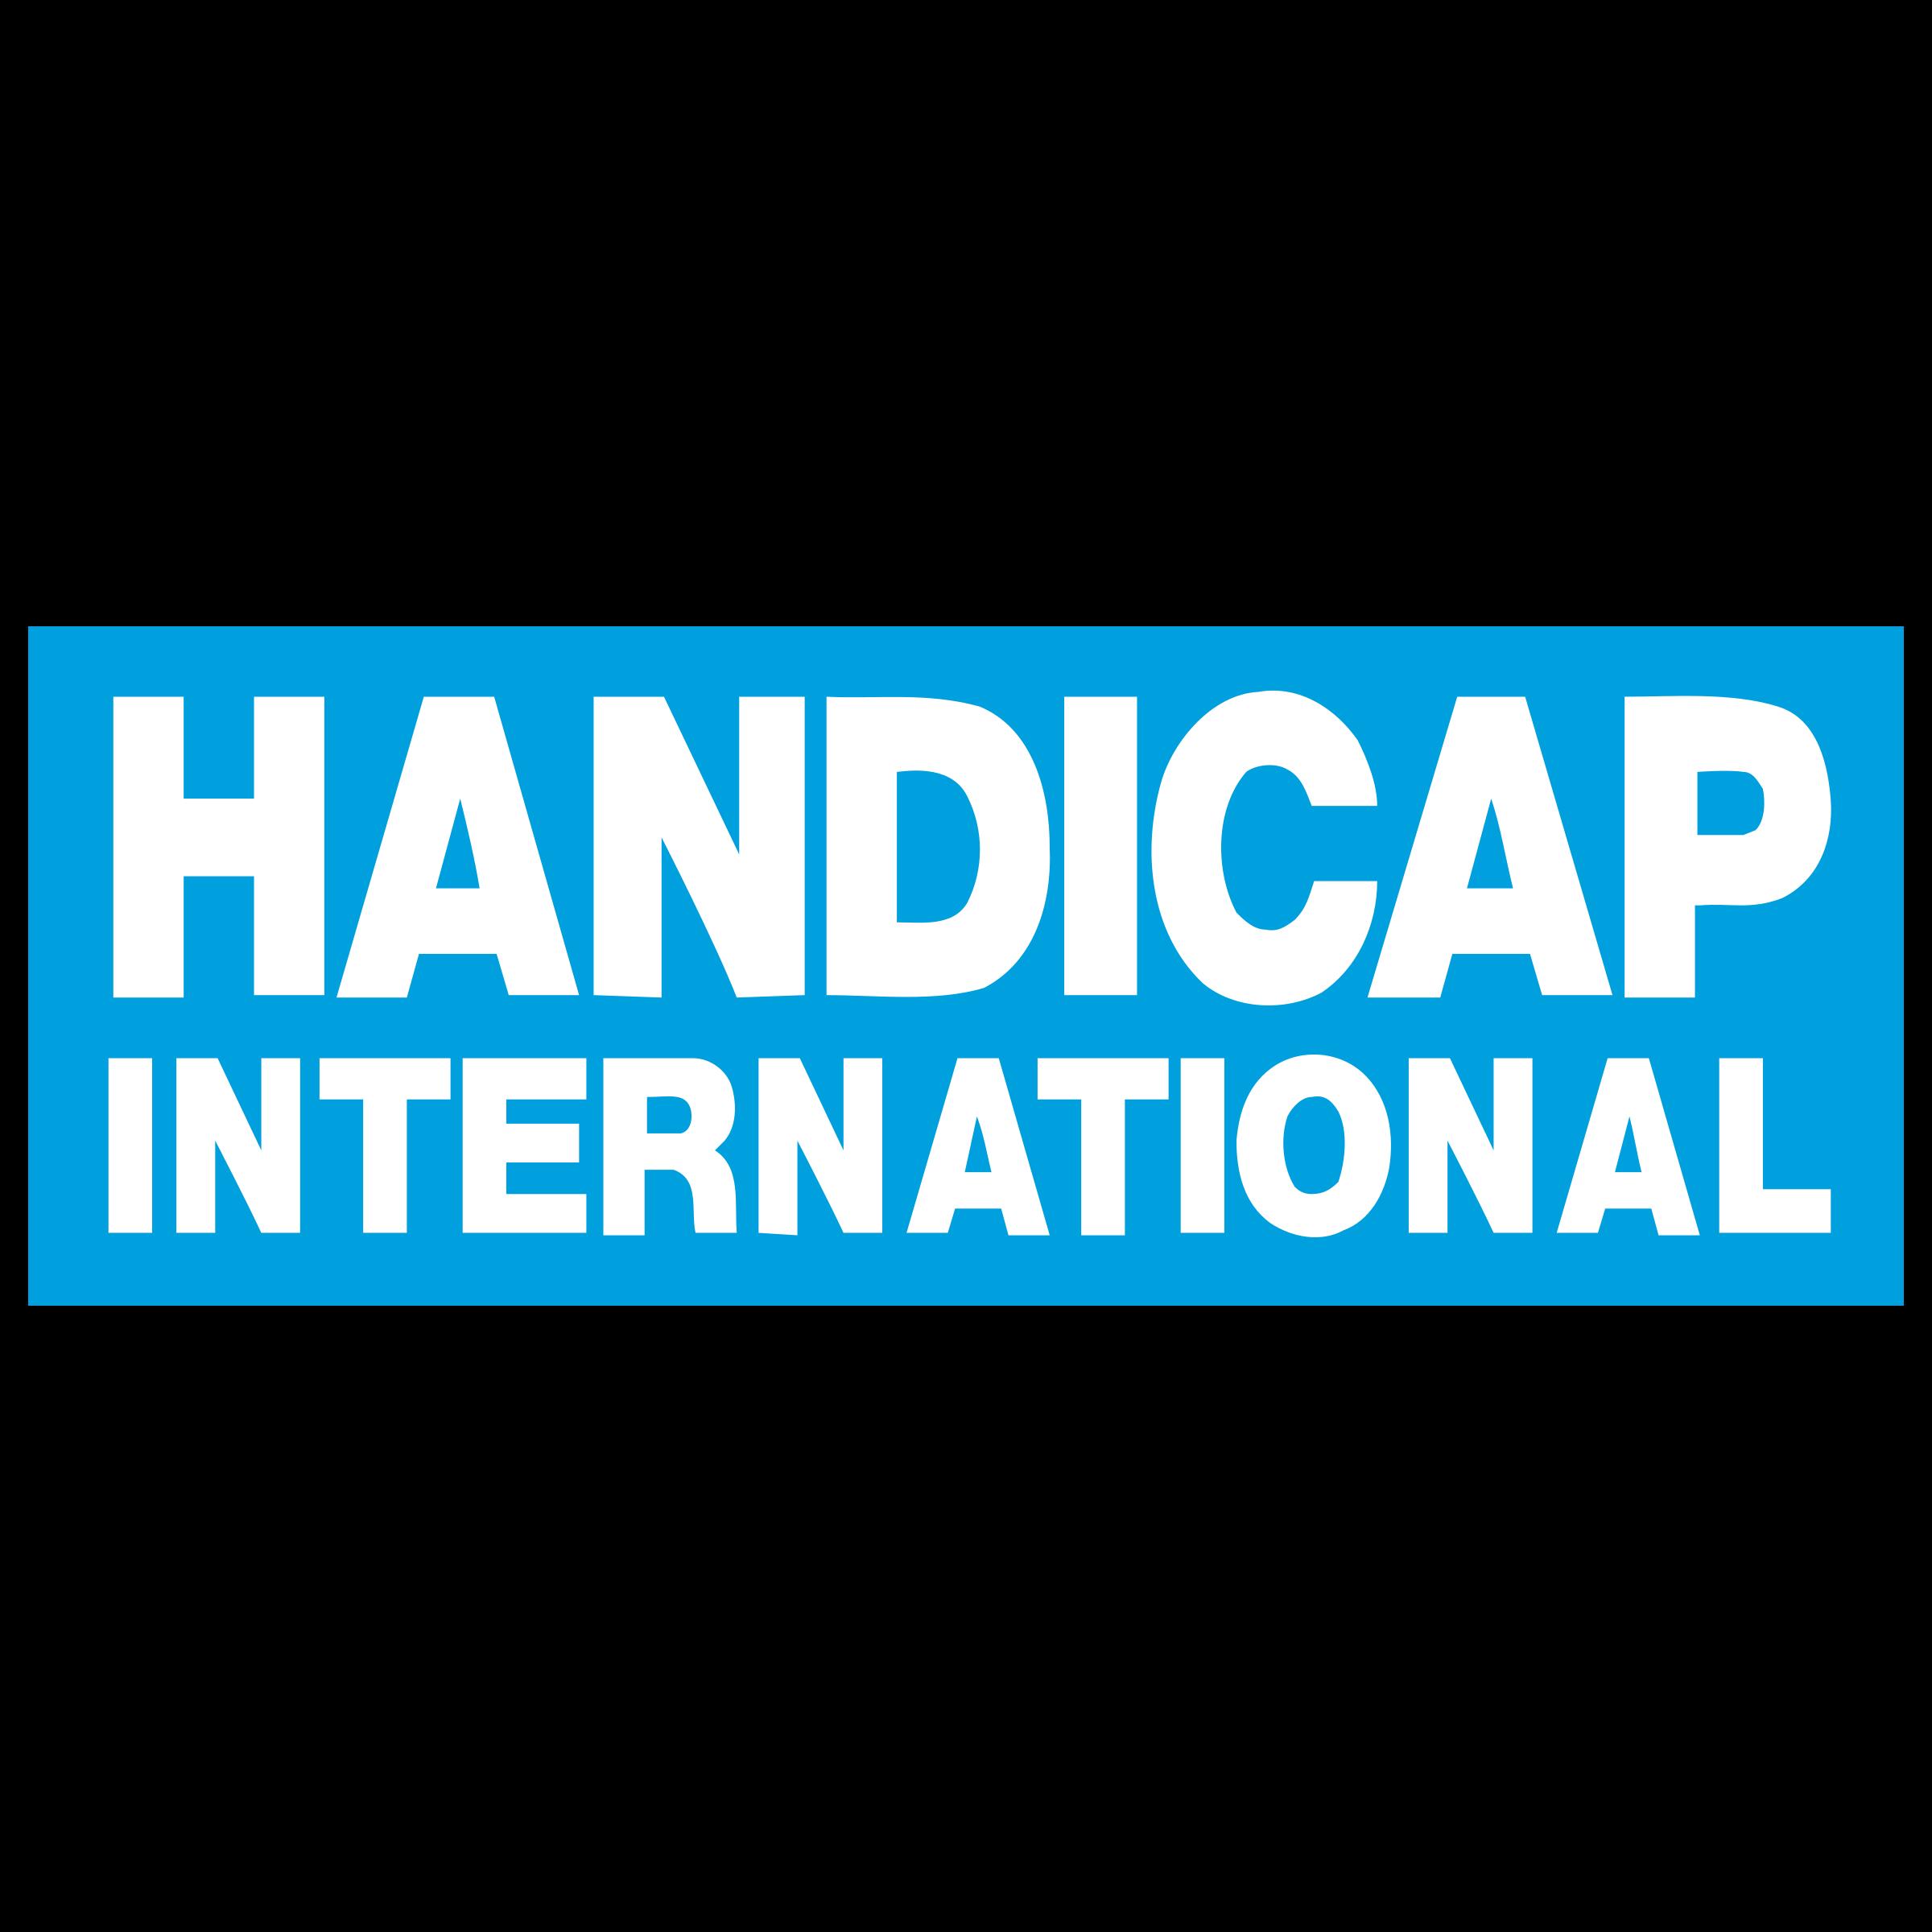 handicap international logo png transparent svg vector freebie